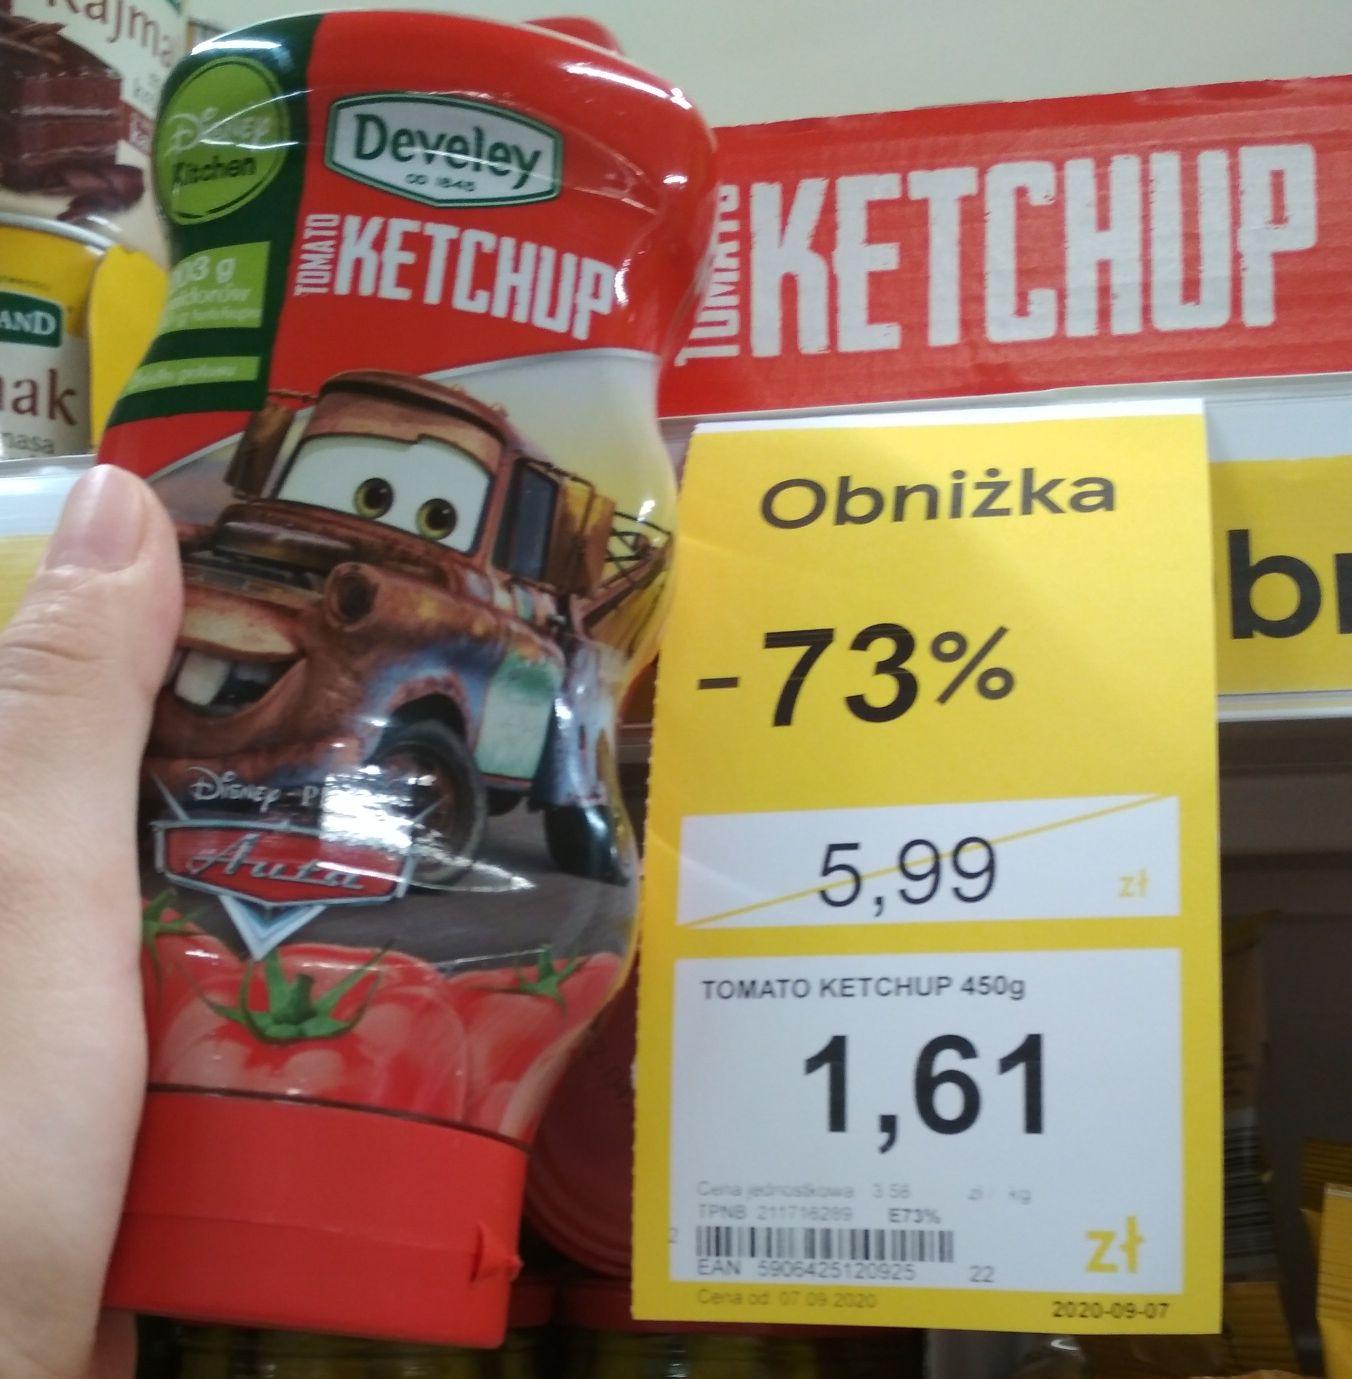 Ketchup develey 450g -73% Tesco Warszawa Młynarska